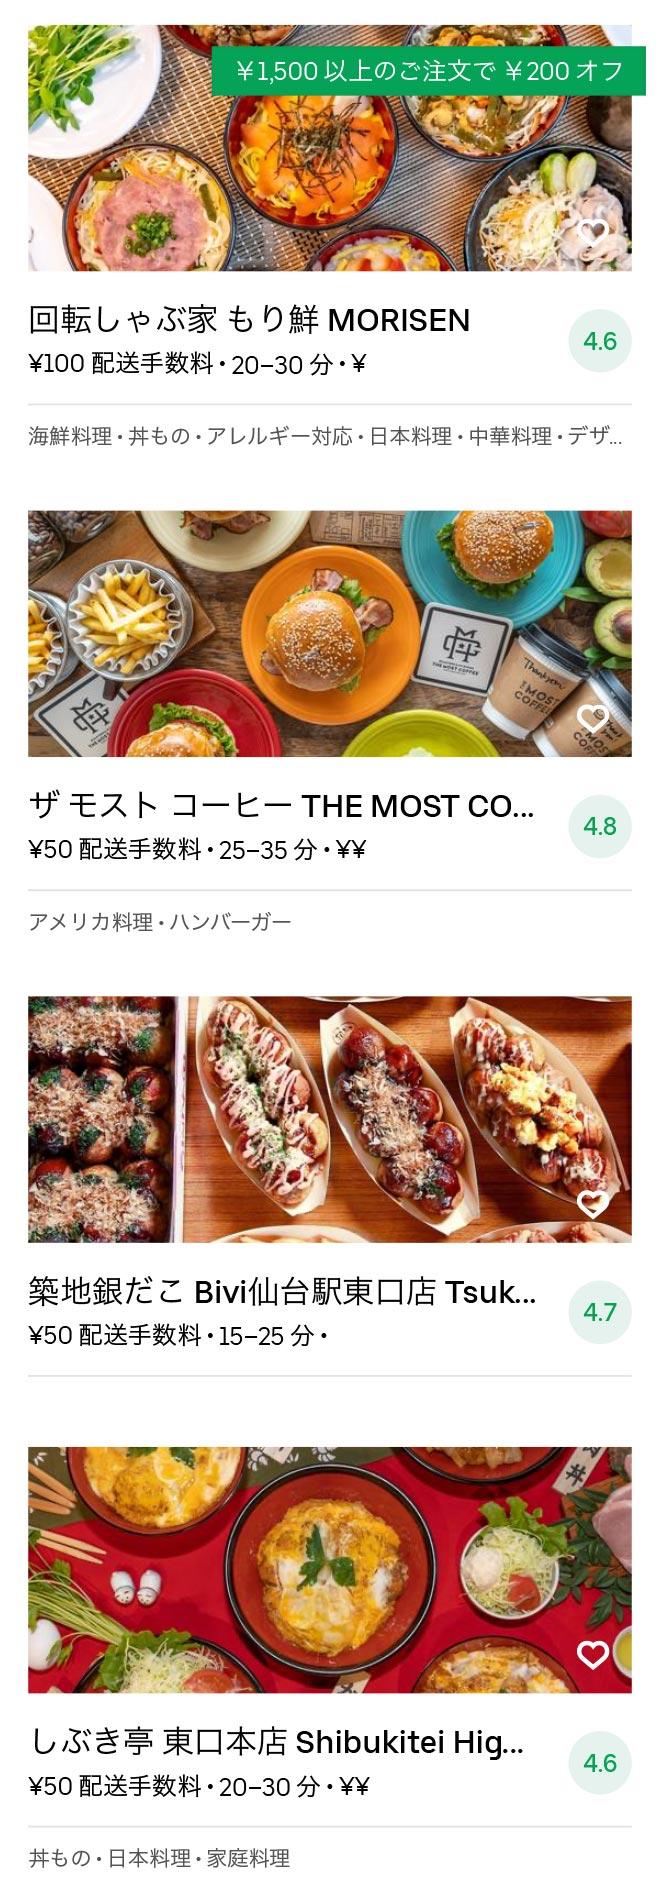 Sendai menu 2008 12